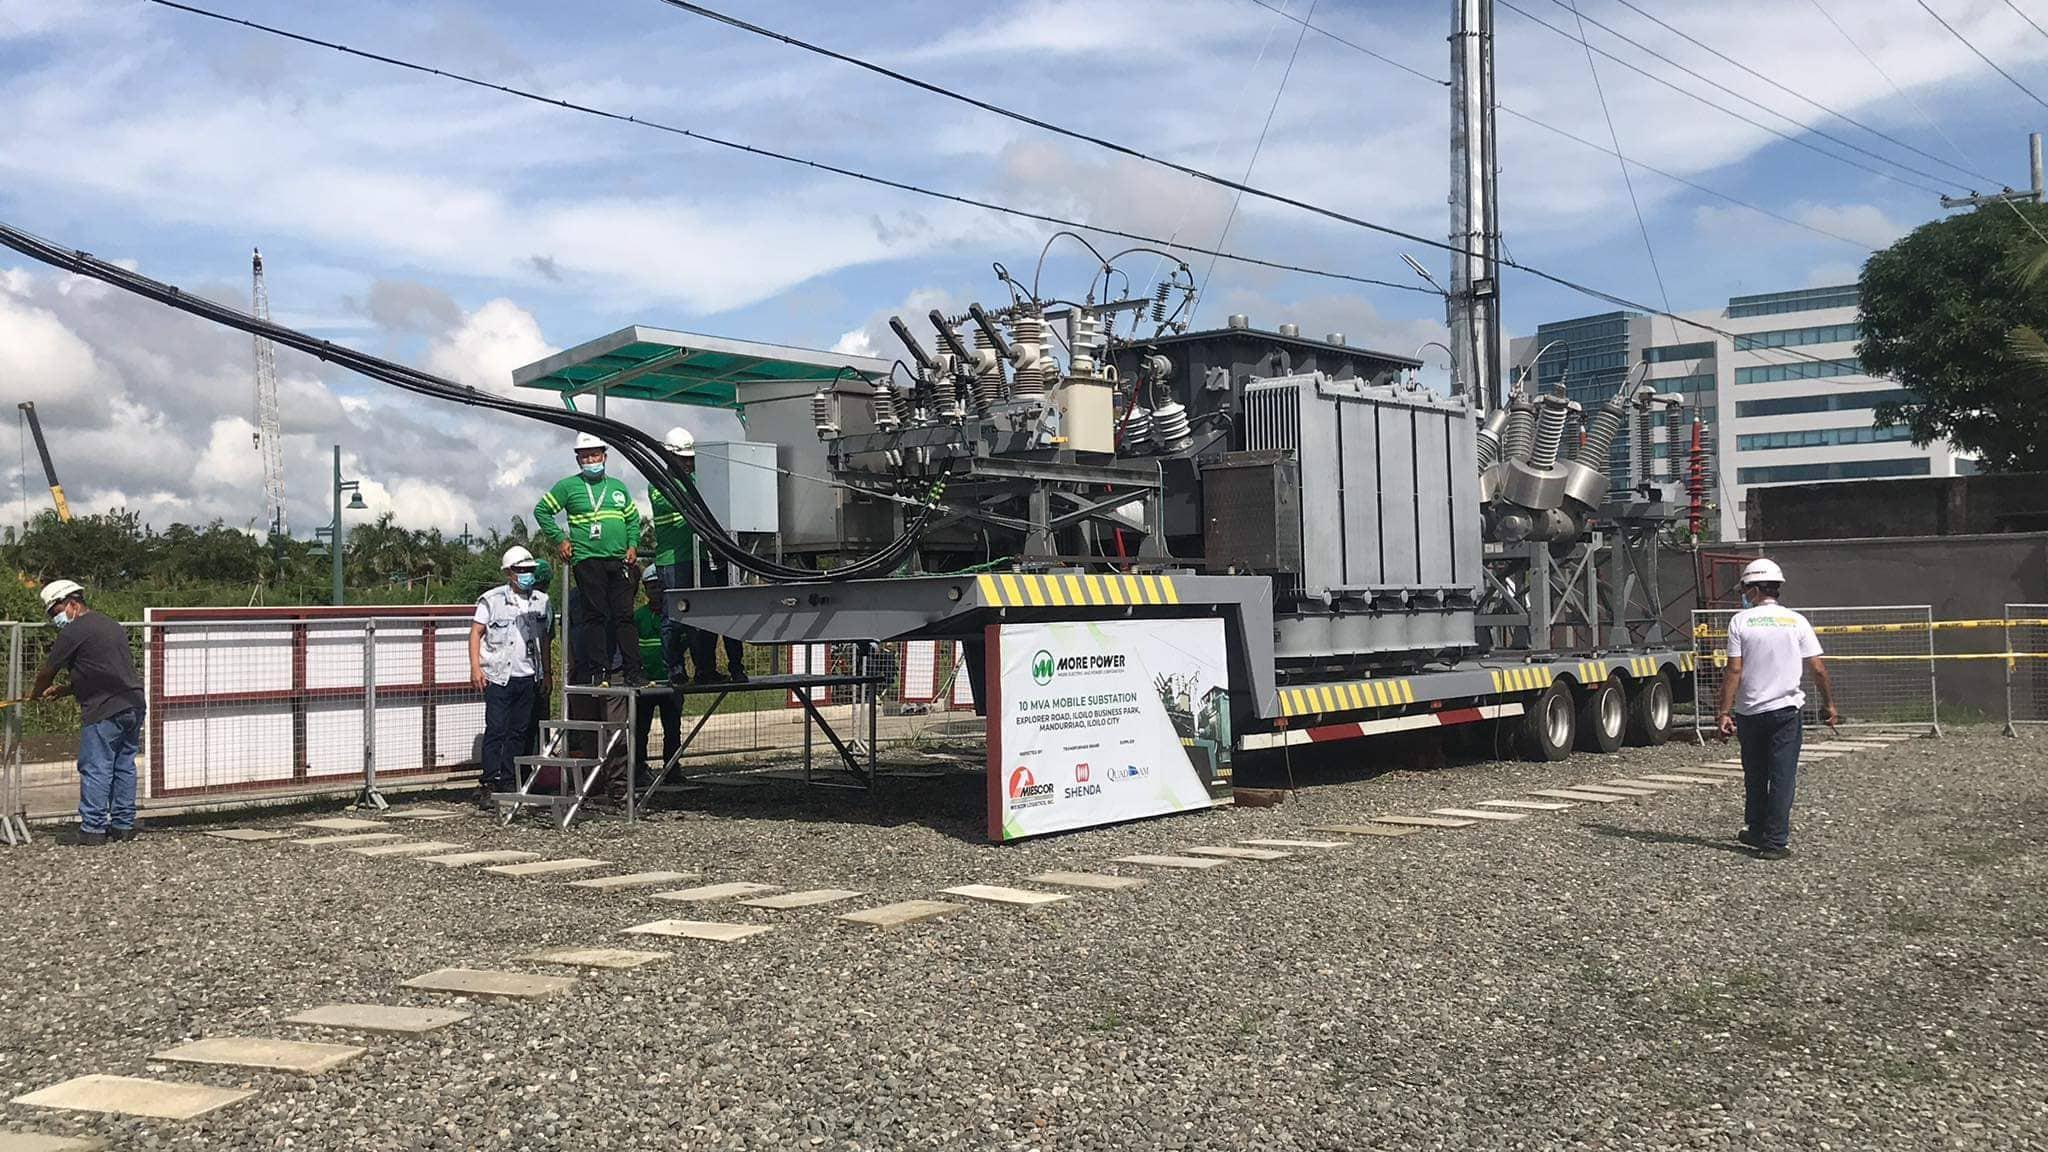 MORE Power 10 MVA mobile substation in Megaworld Iloilo Business Park.